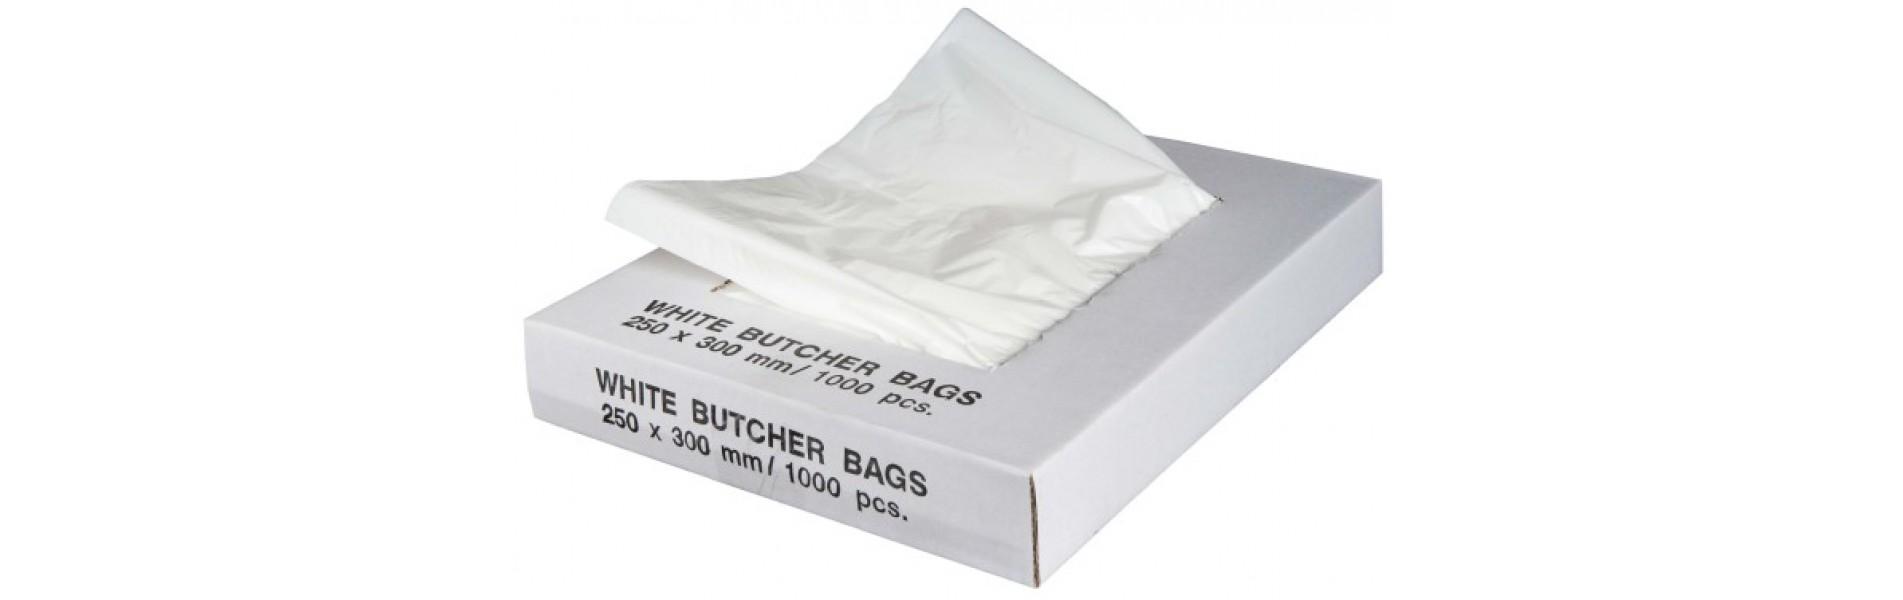 Butcher Bags